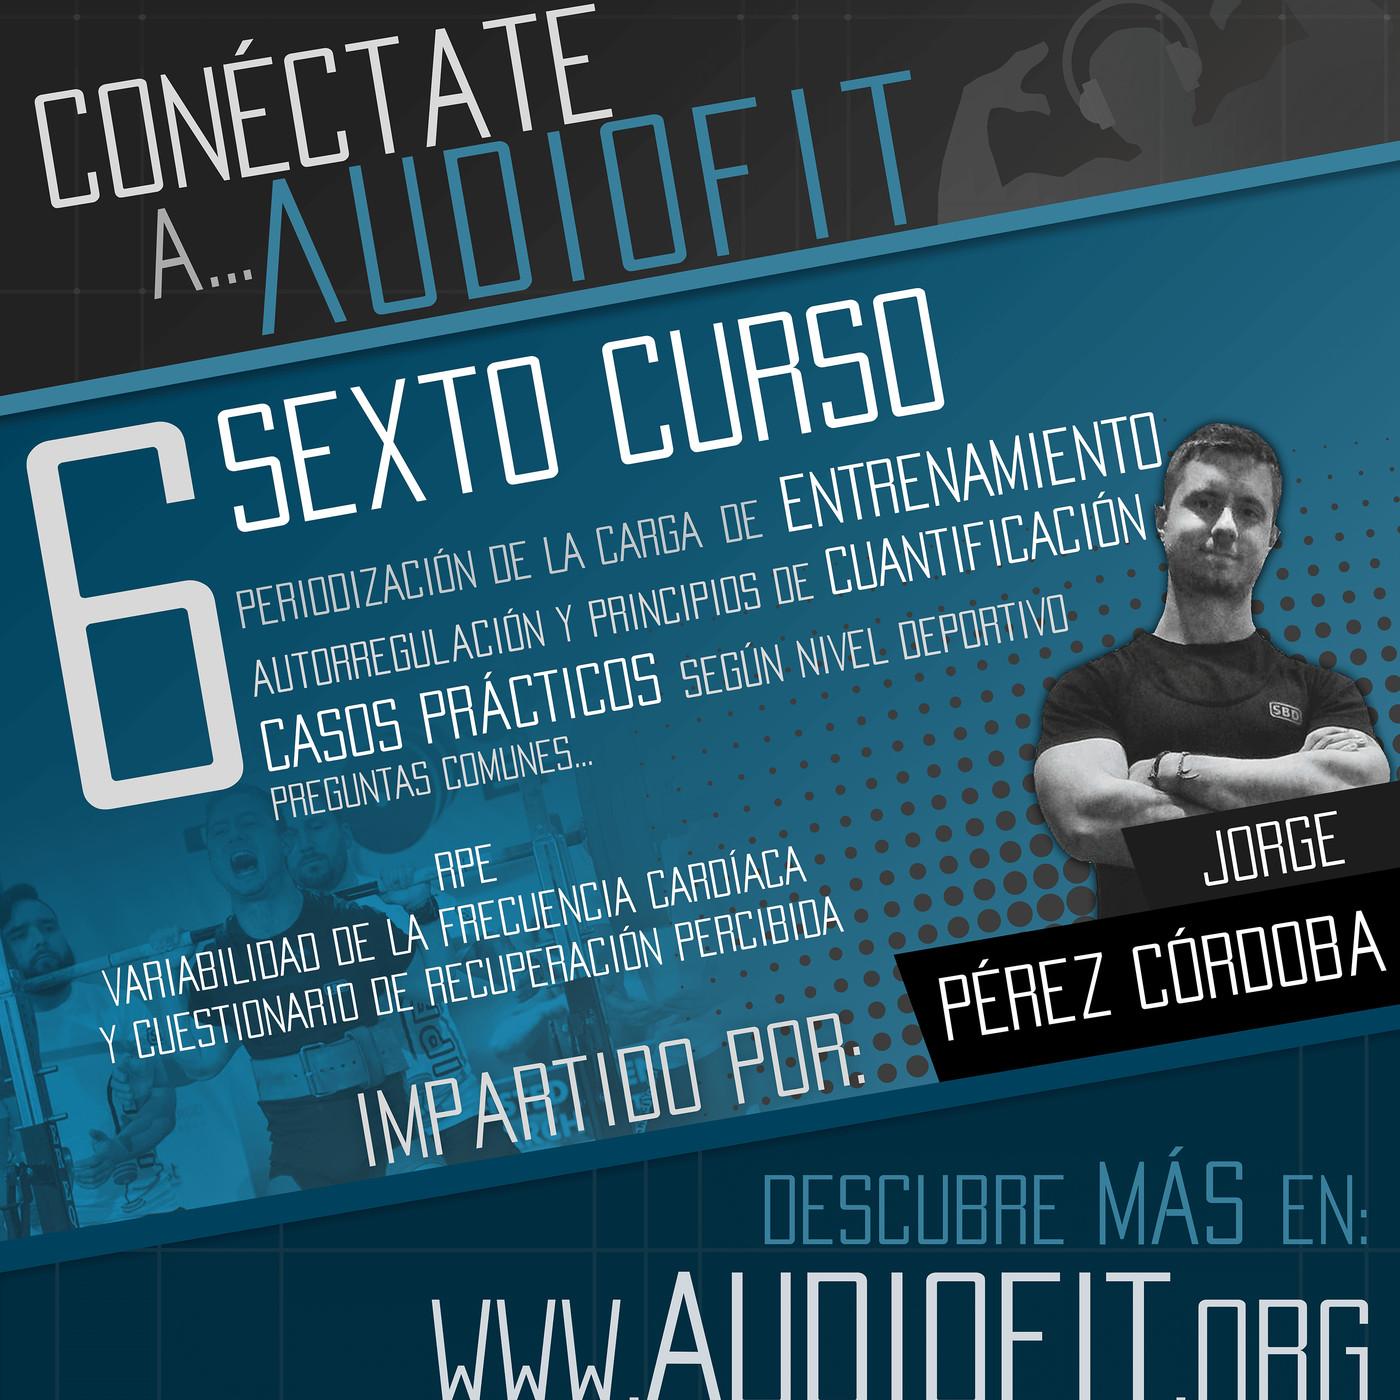 Nivel de Activación y Campo Atencional - Jorge Pérez Córdoba